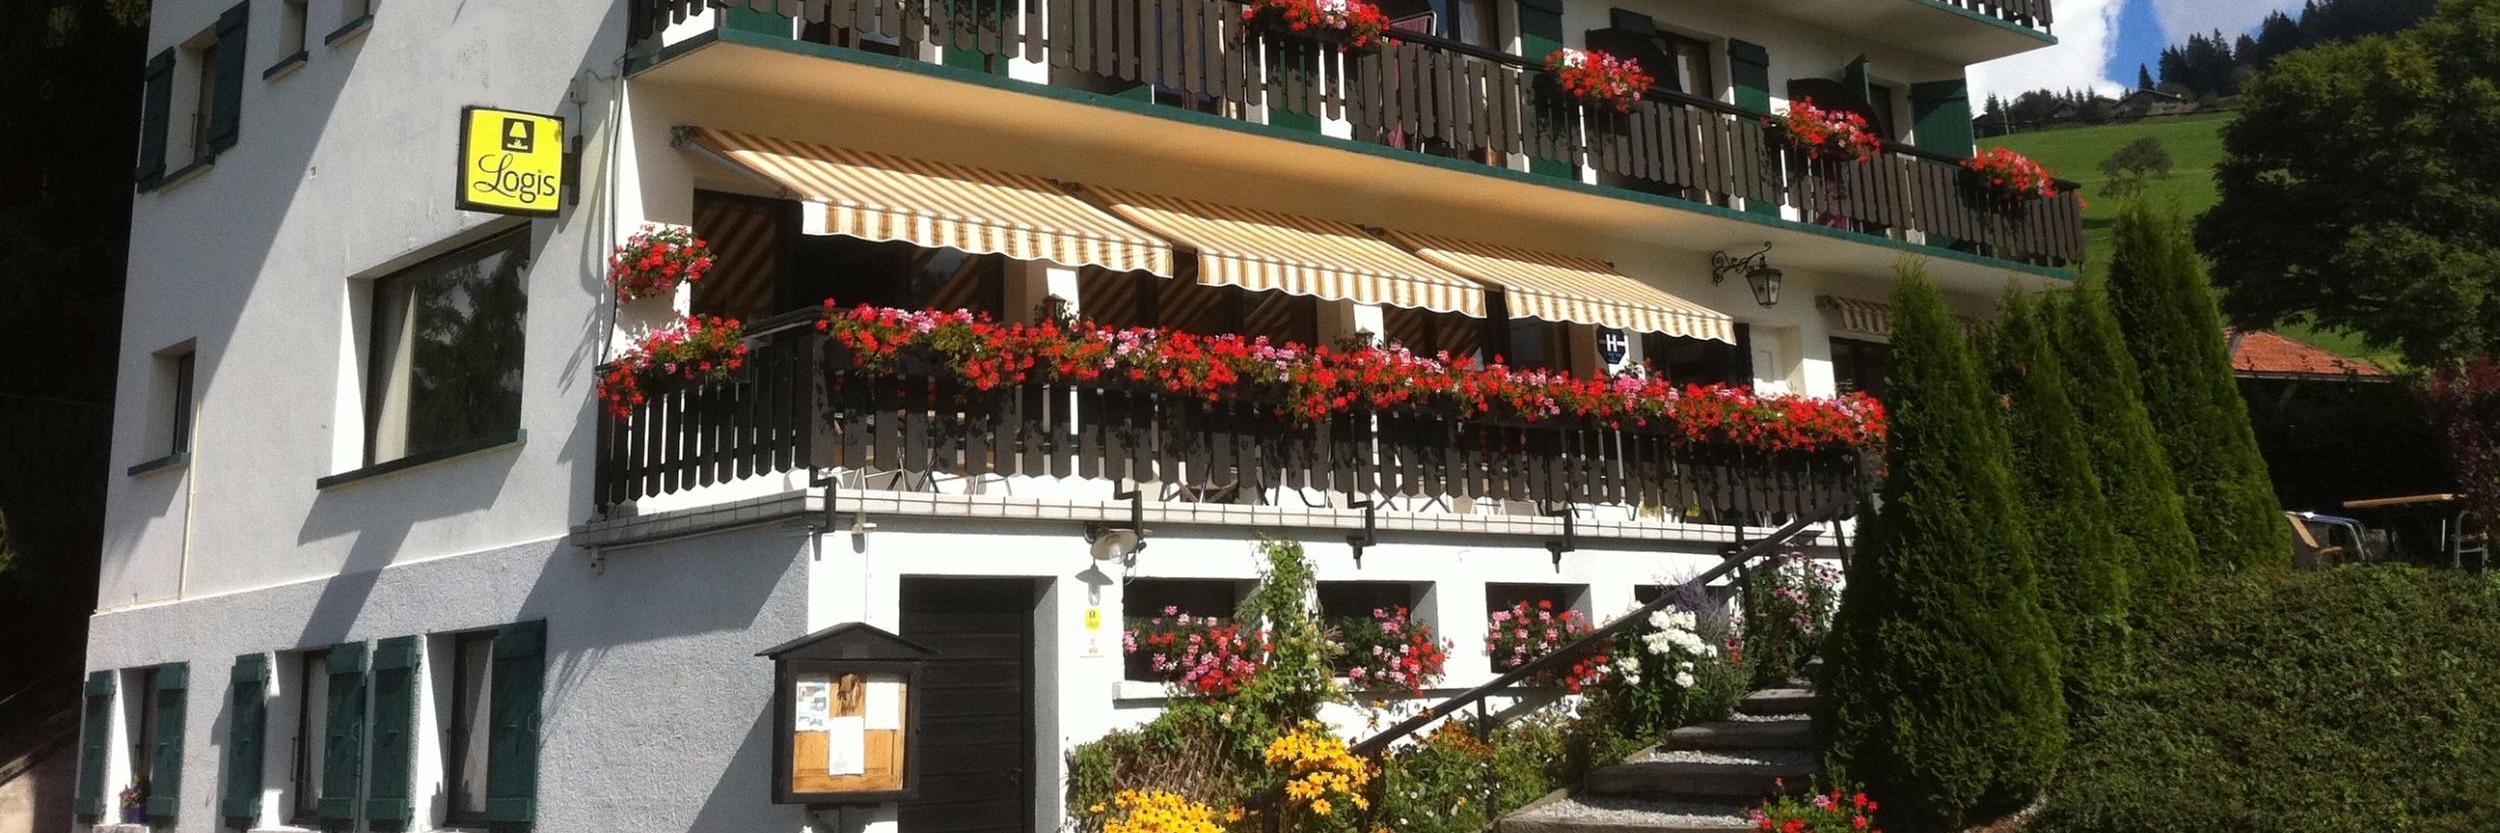 hotel caprice vert: